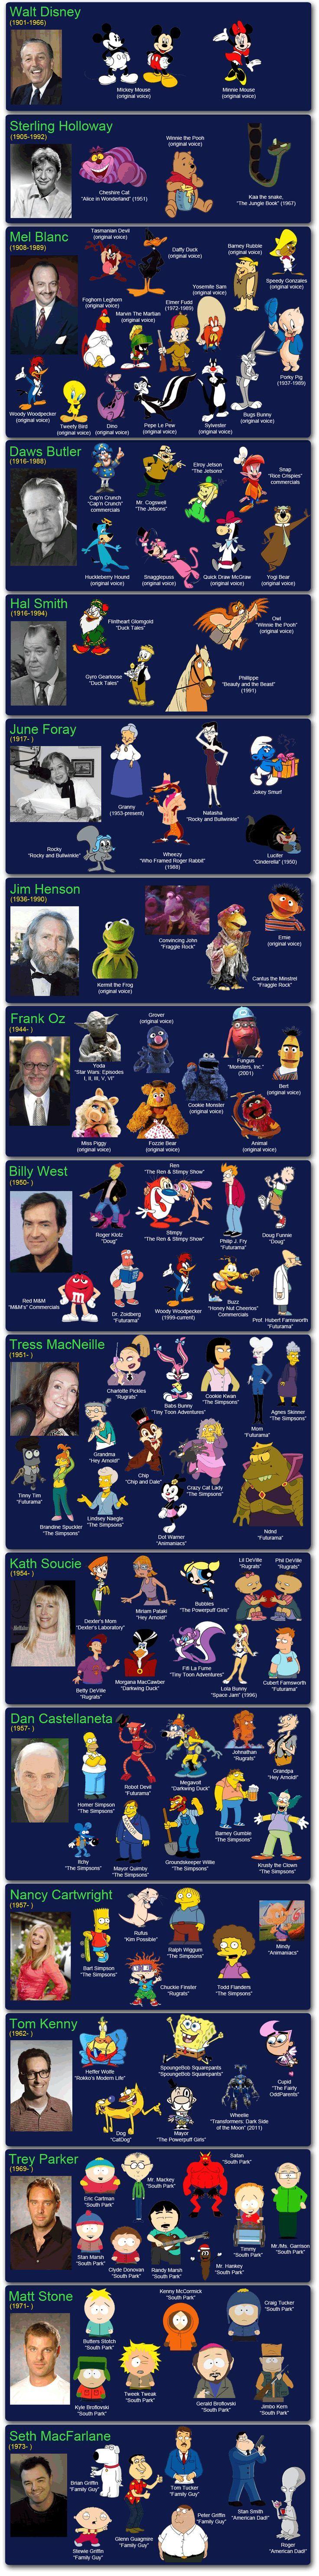 Cartoon voice actors. Christine Cavanaugh played Chuckie until 2002. Then Nancy Cartwright (Bart Simpson) took over until 2008.